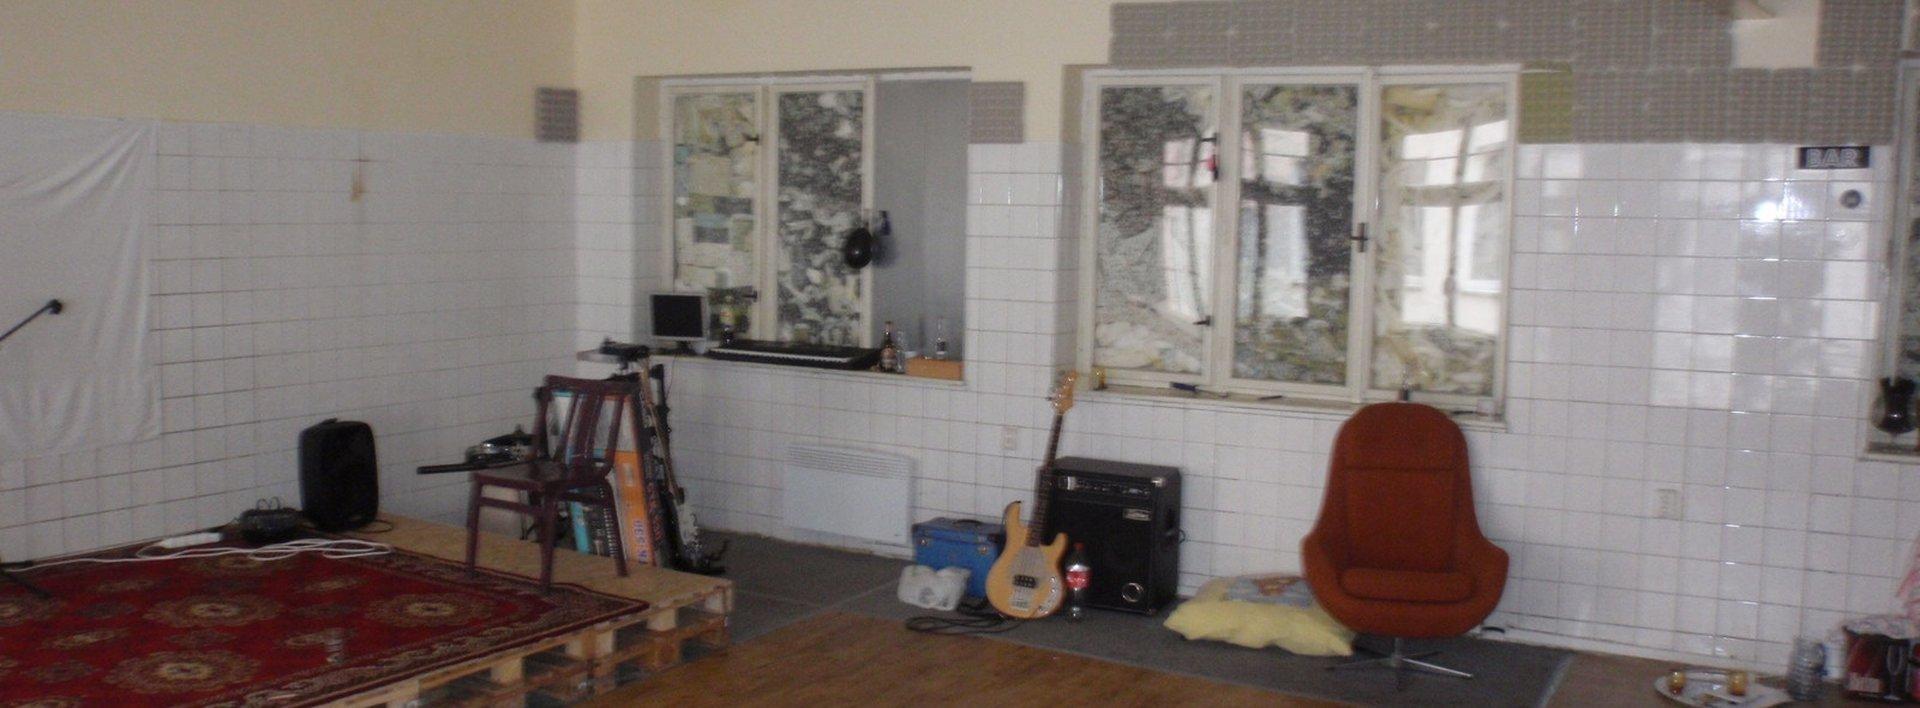 Pronájem, sklad - ateliér,  80m² - Liberec IV, Moskevská, Ev.č.: N48734